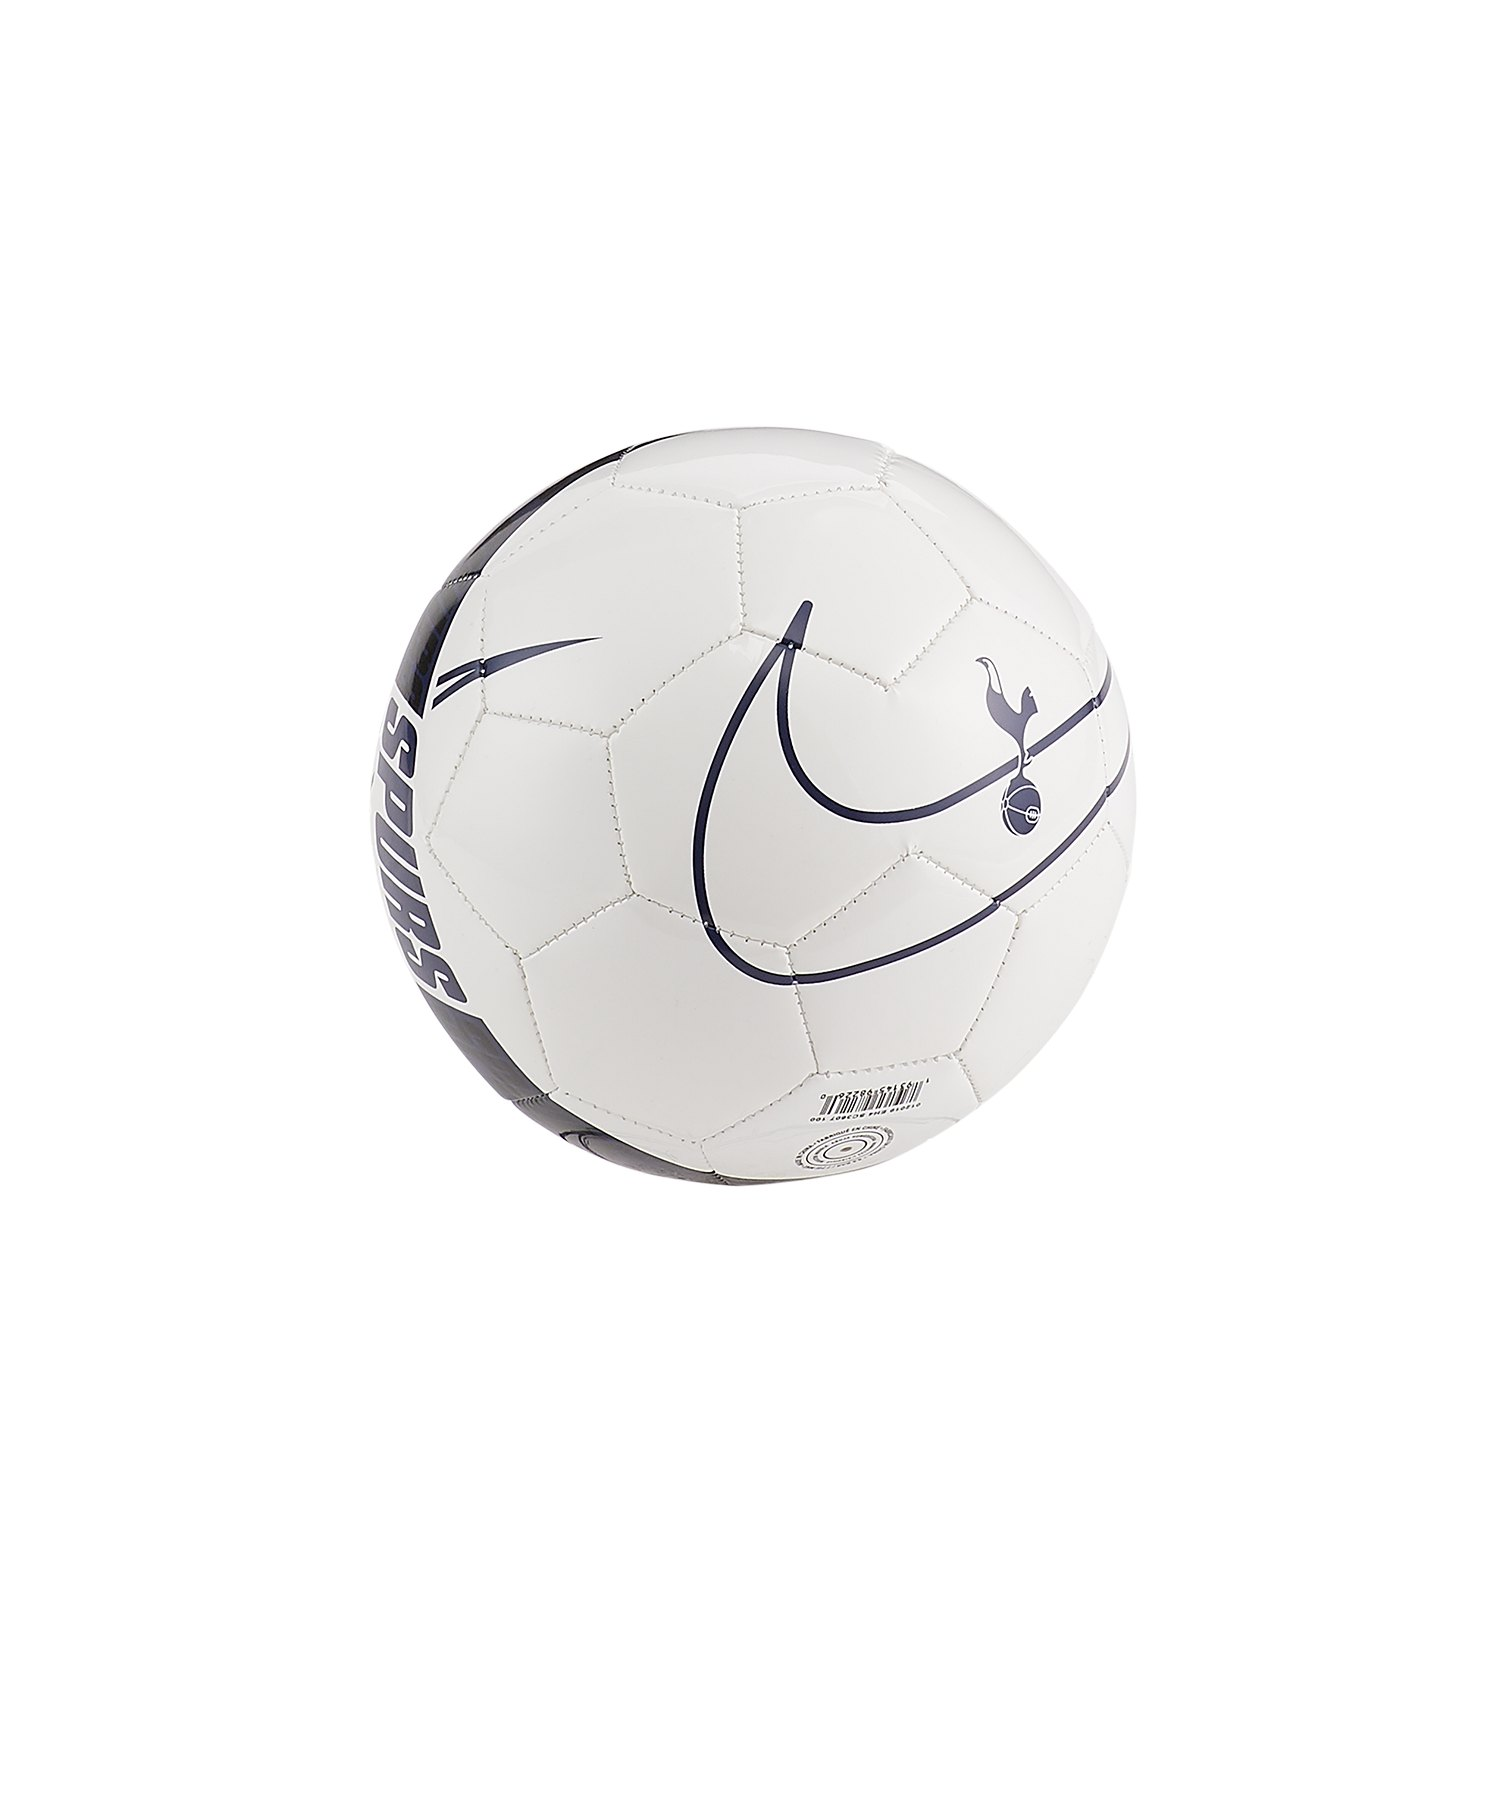 Nike Tottenham Hotspur Skills Miniball Weiss F100 - weiss